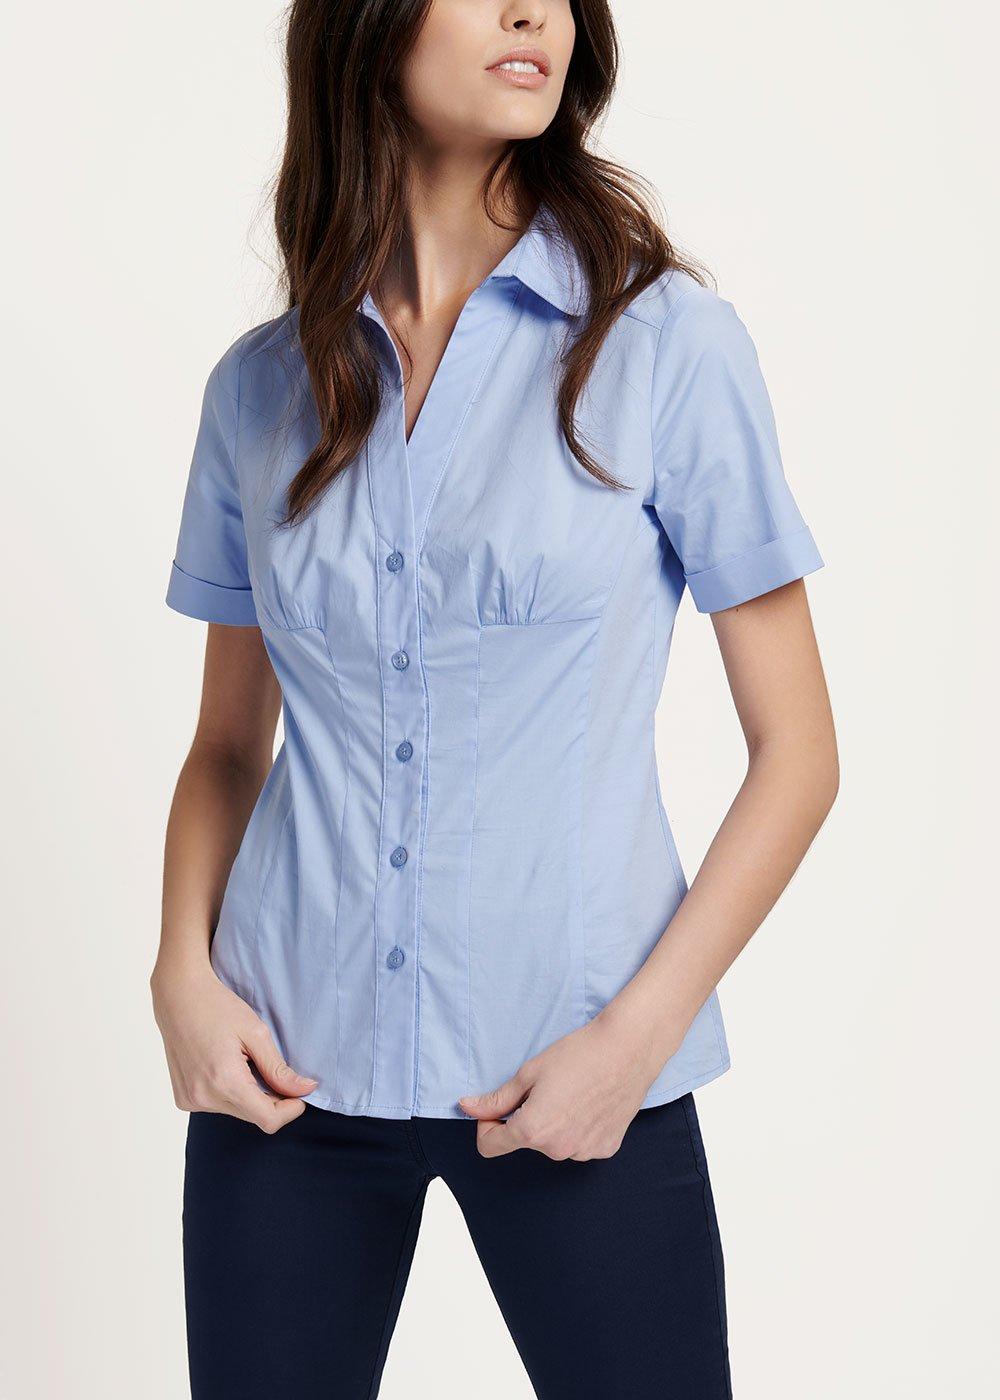 Scarlette shirt with short sleeves - Rugiada - Woman